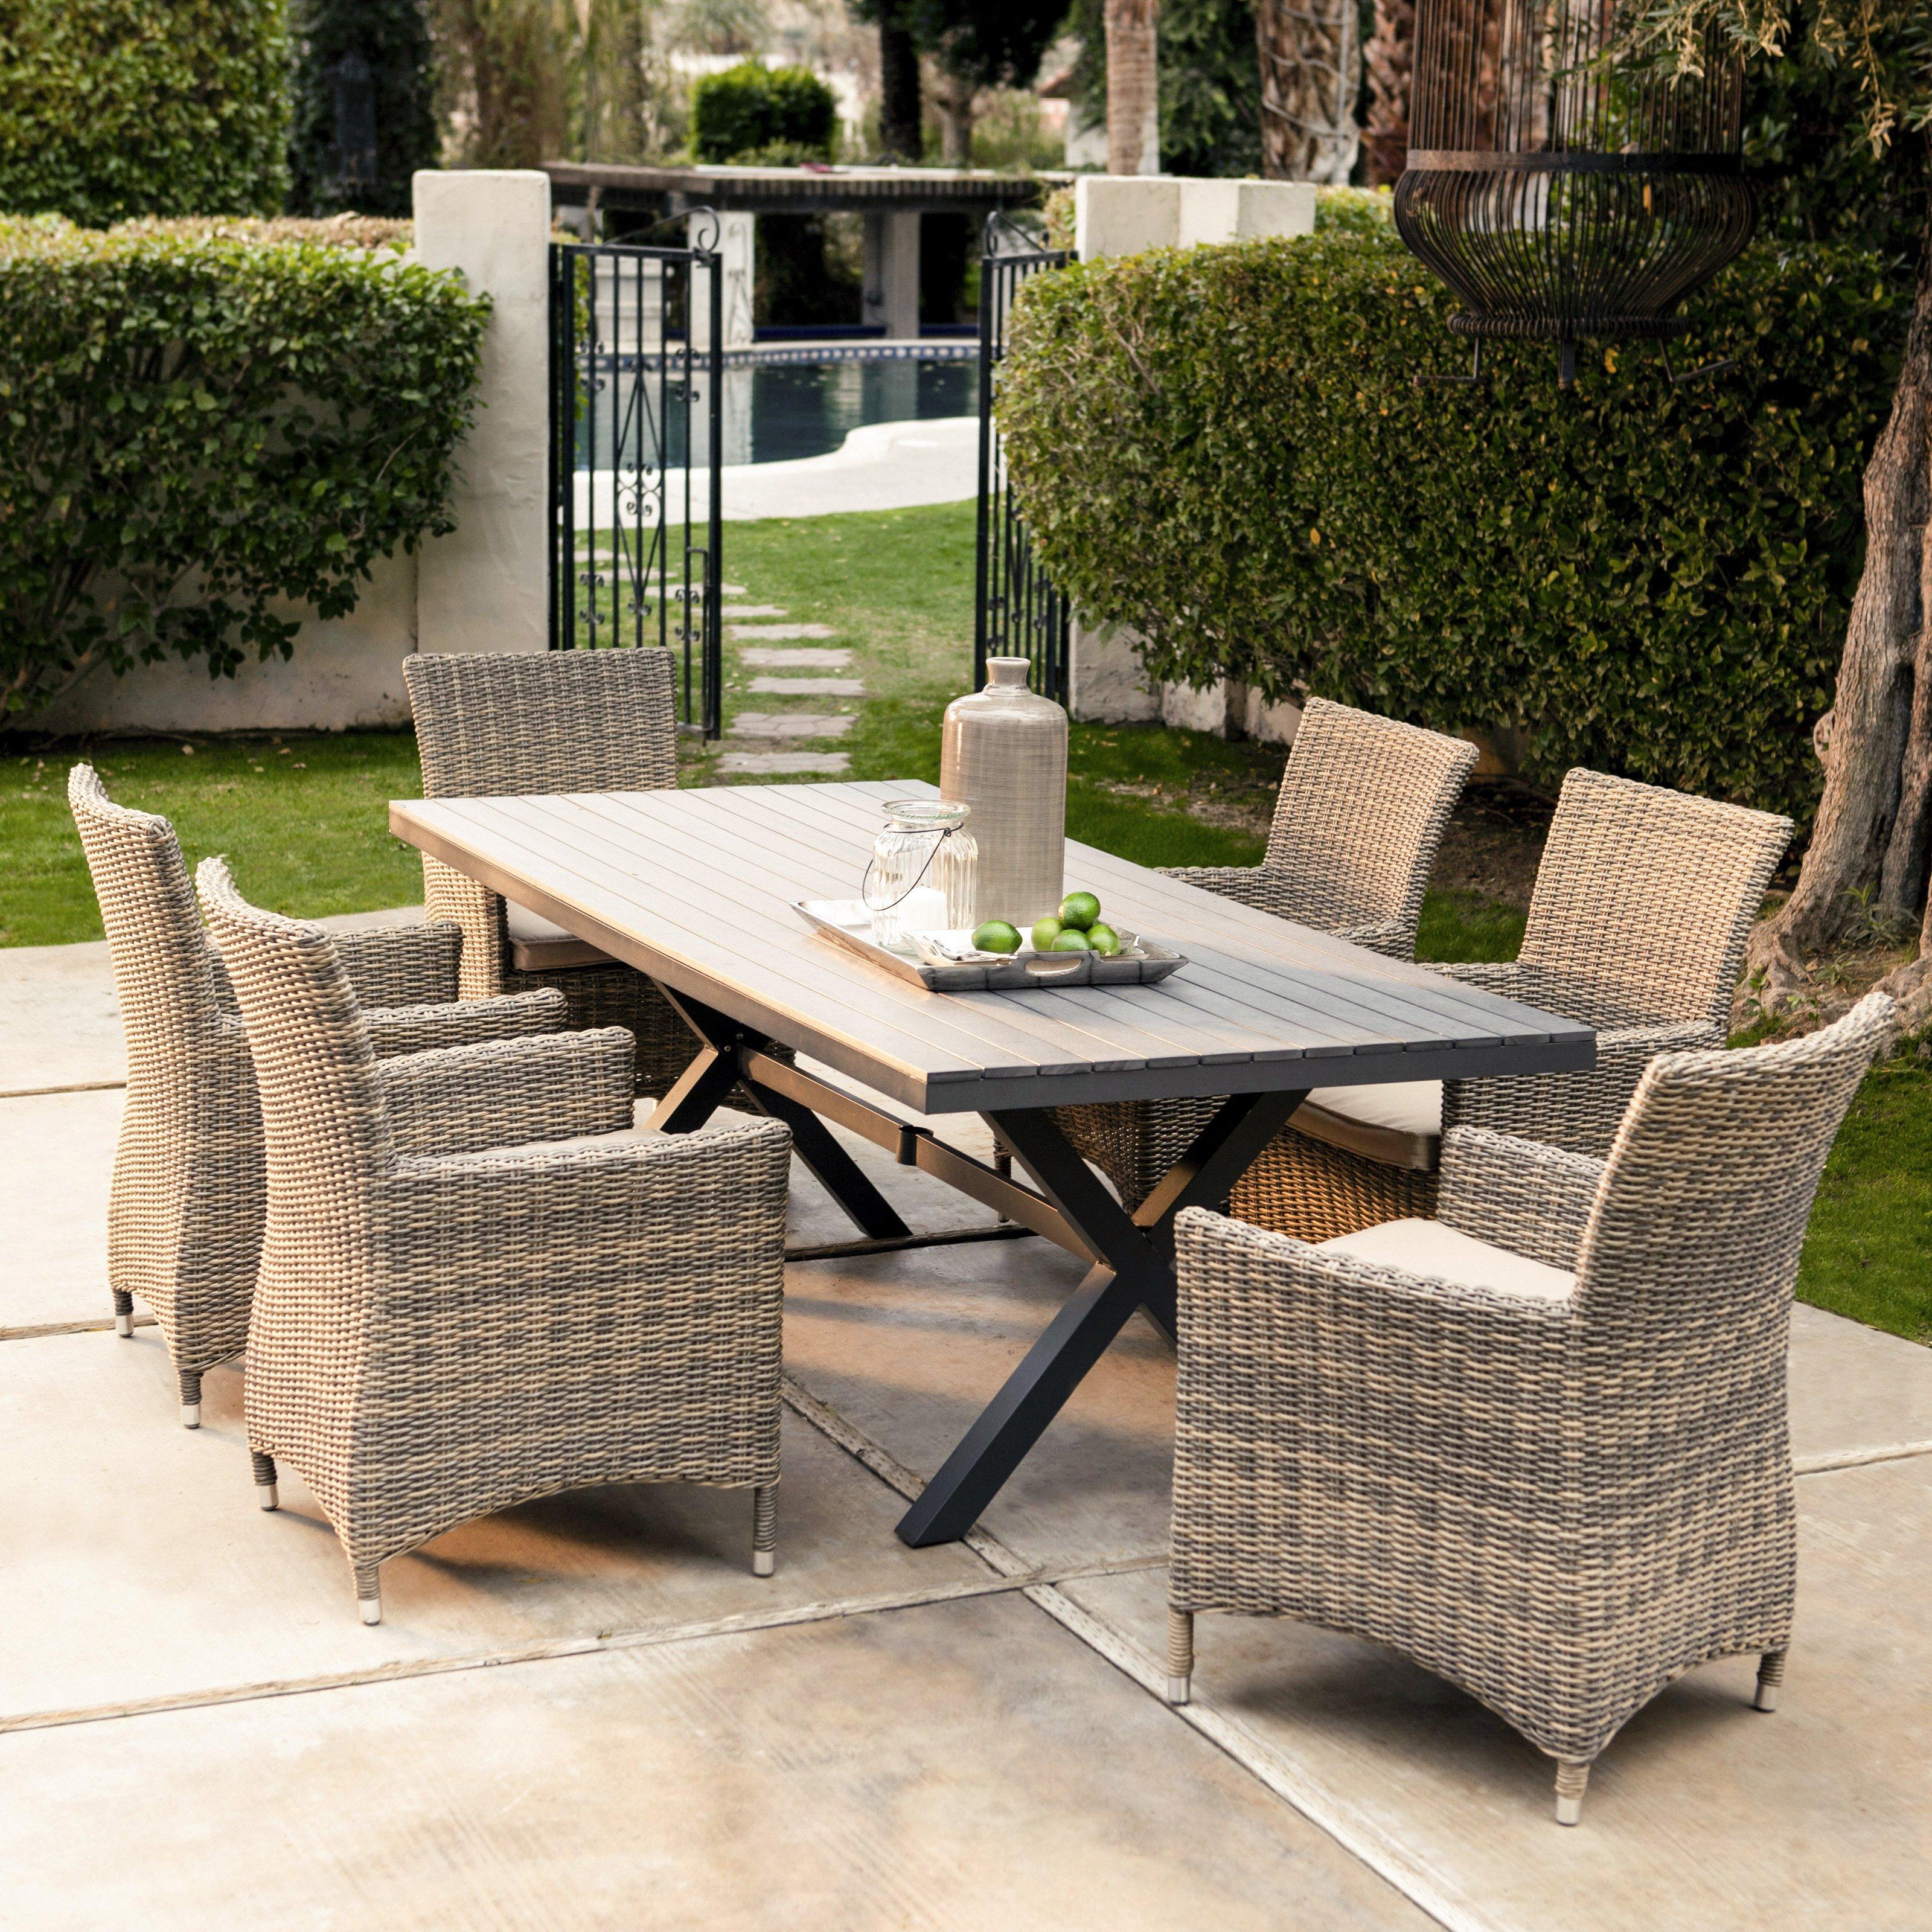 belham living bella all weather wicker 7 piece patio dining set - seats ISYCSMV